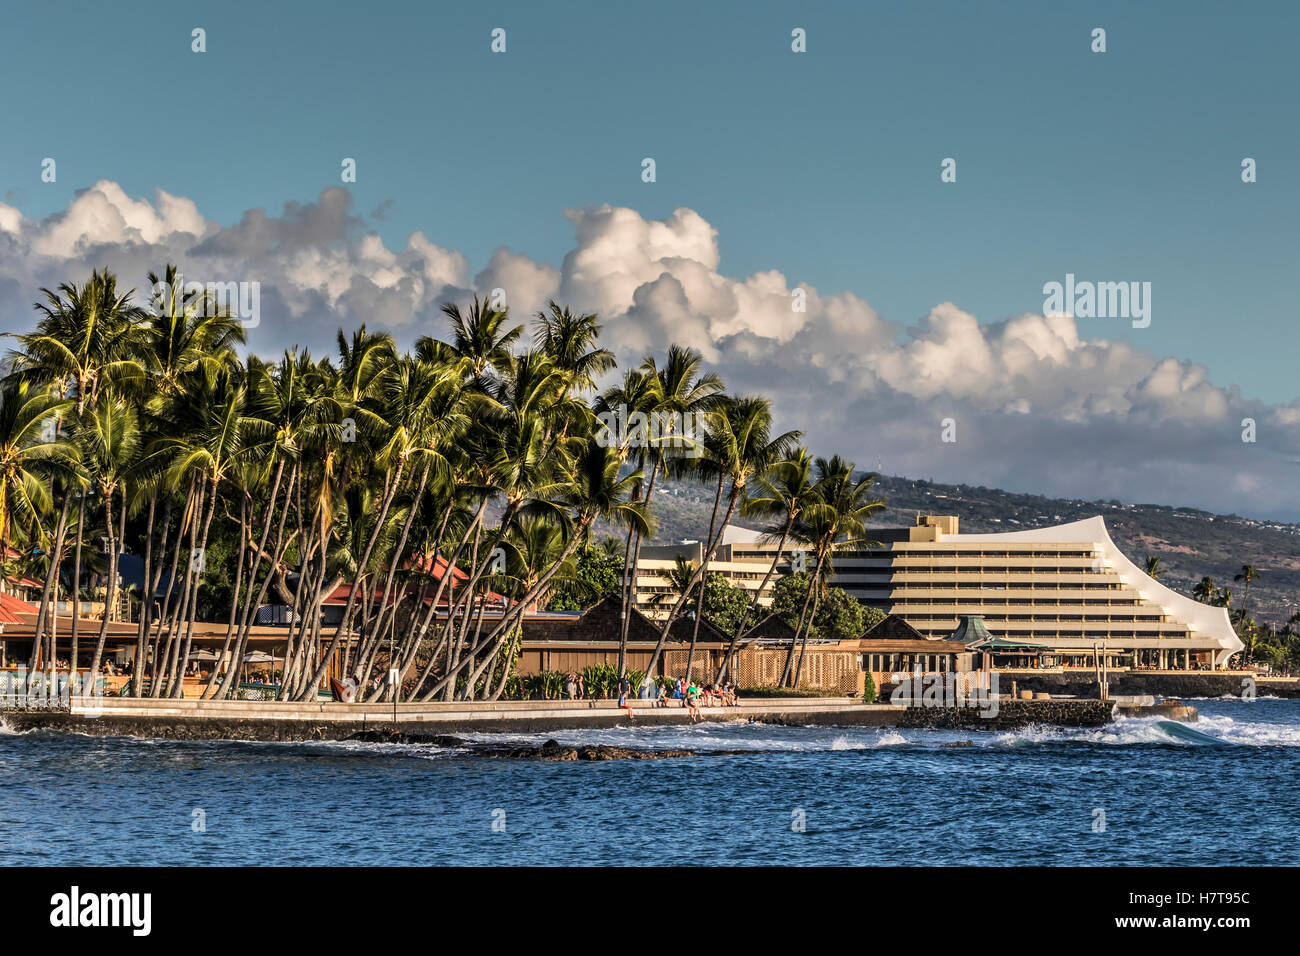 Kailua Kona, Hawaii Stock Photos & Kailua Kona, Hawaii Stock Images ...